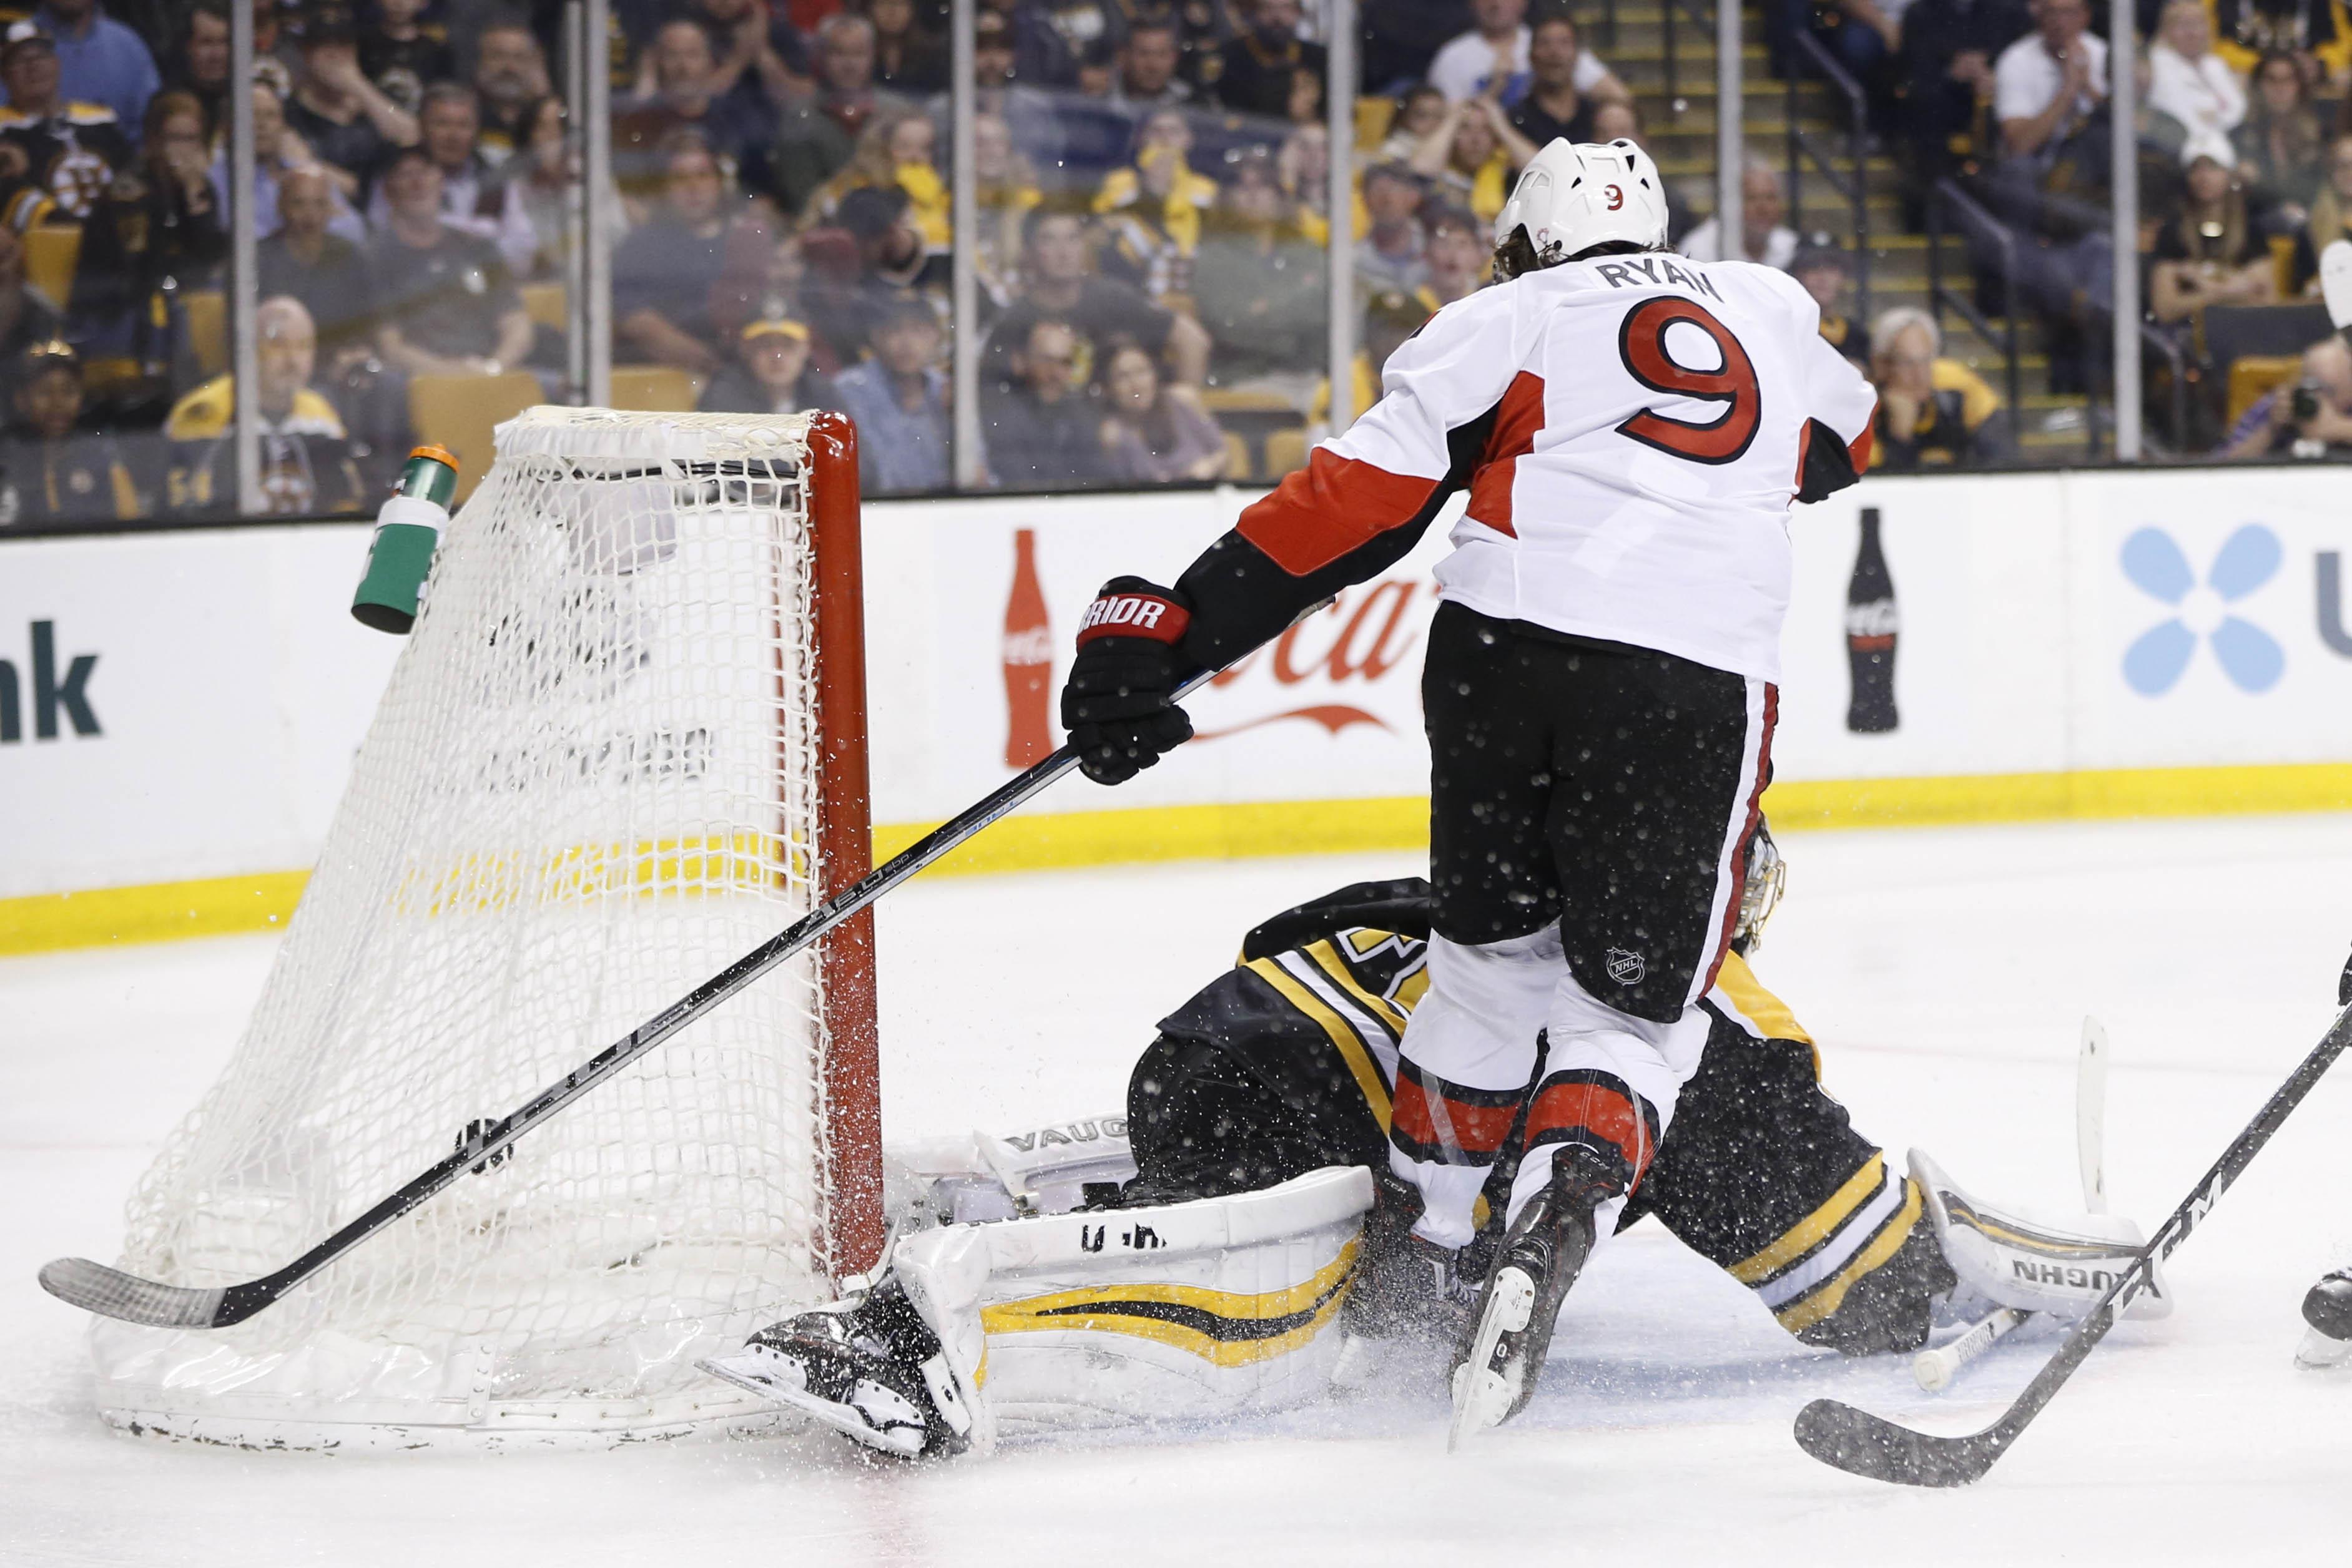 10017733-nhl-stanley-cup-playoffs-ottawa-senators-at-boston-bruins